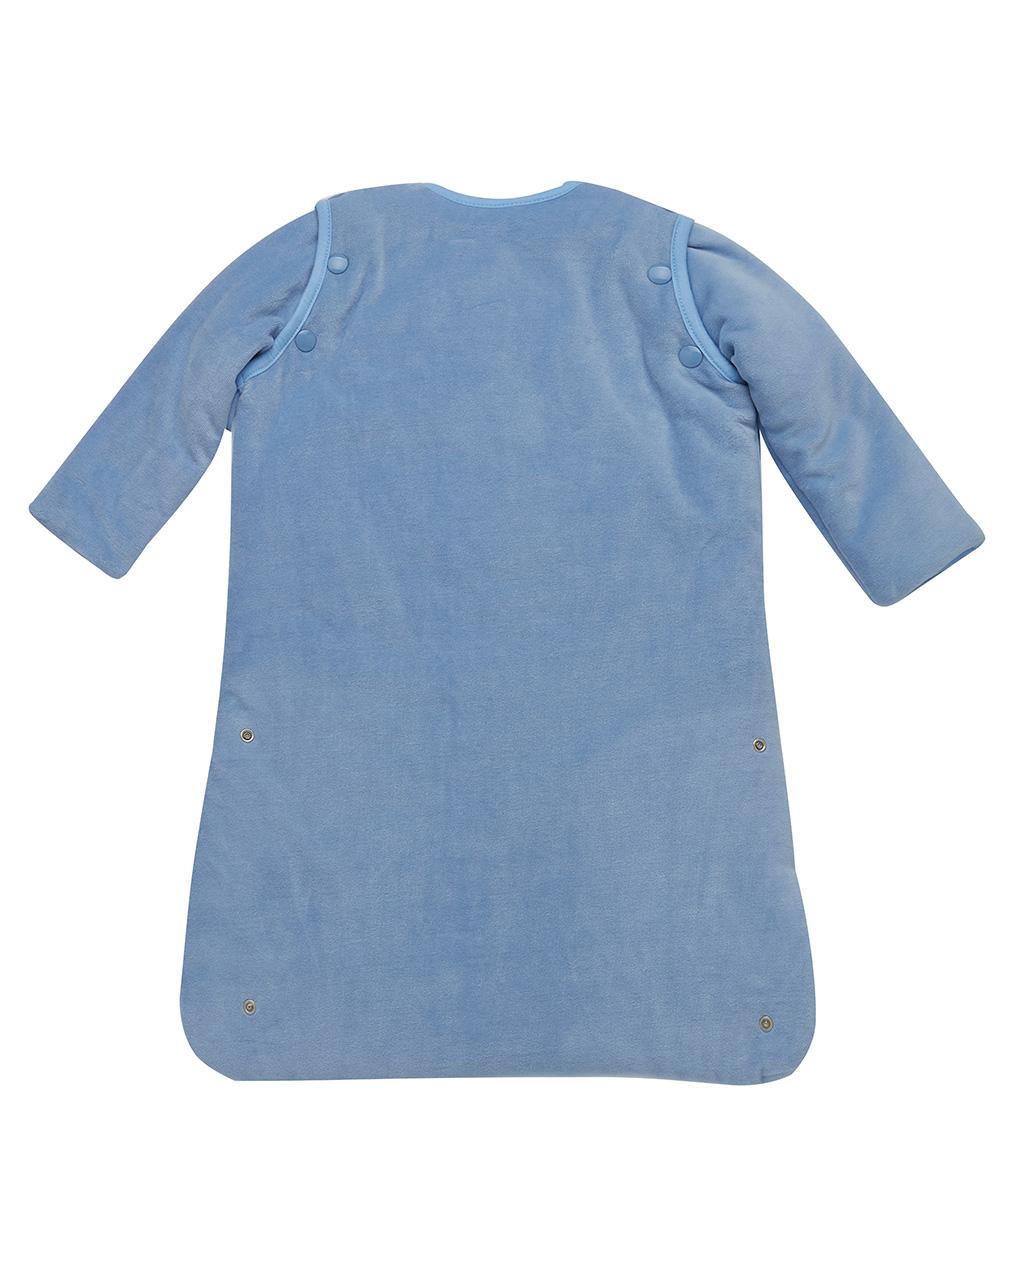 Saco de dormir acolchoado - Prénatal